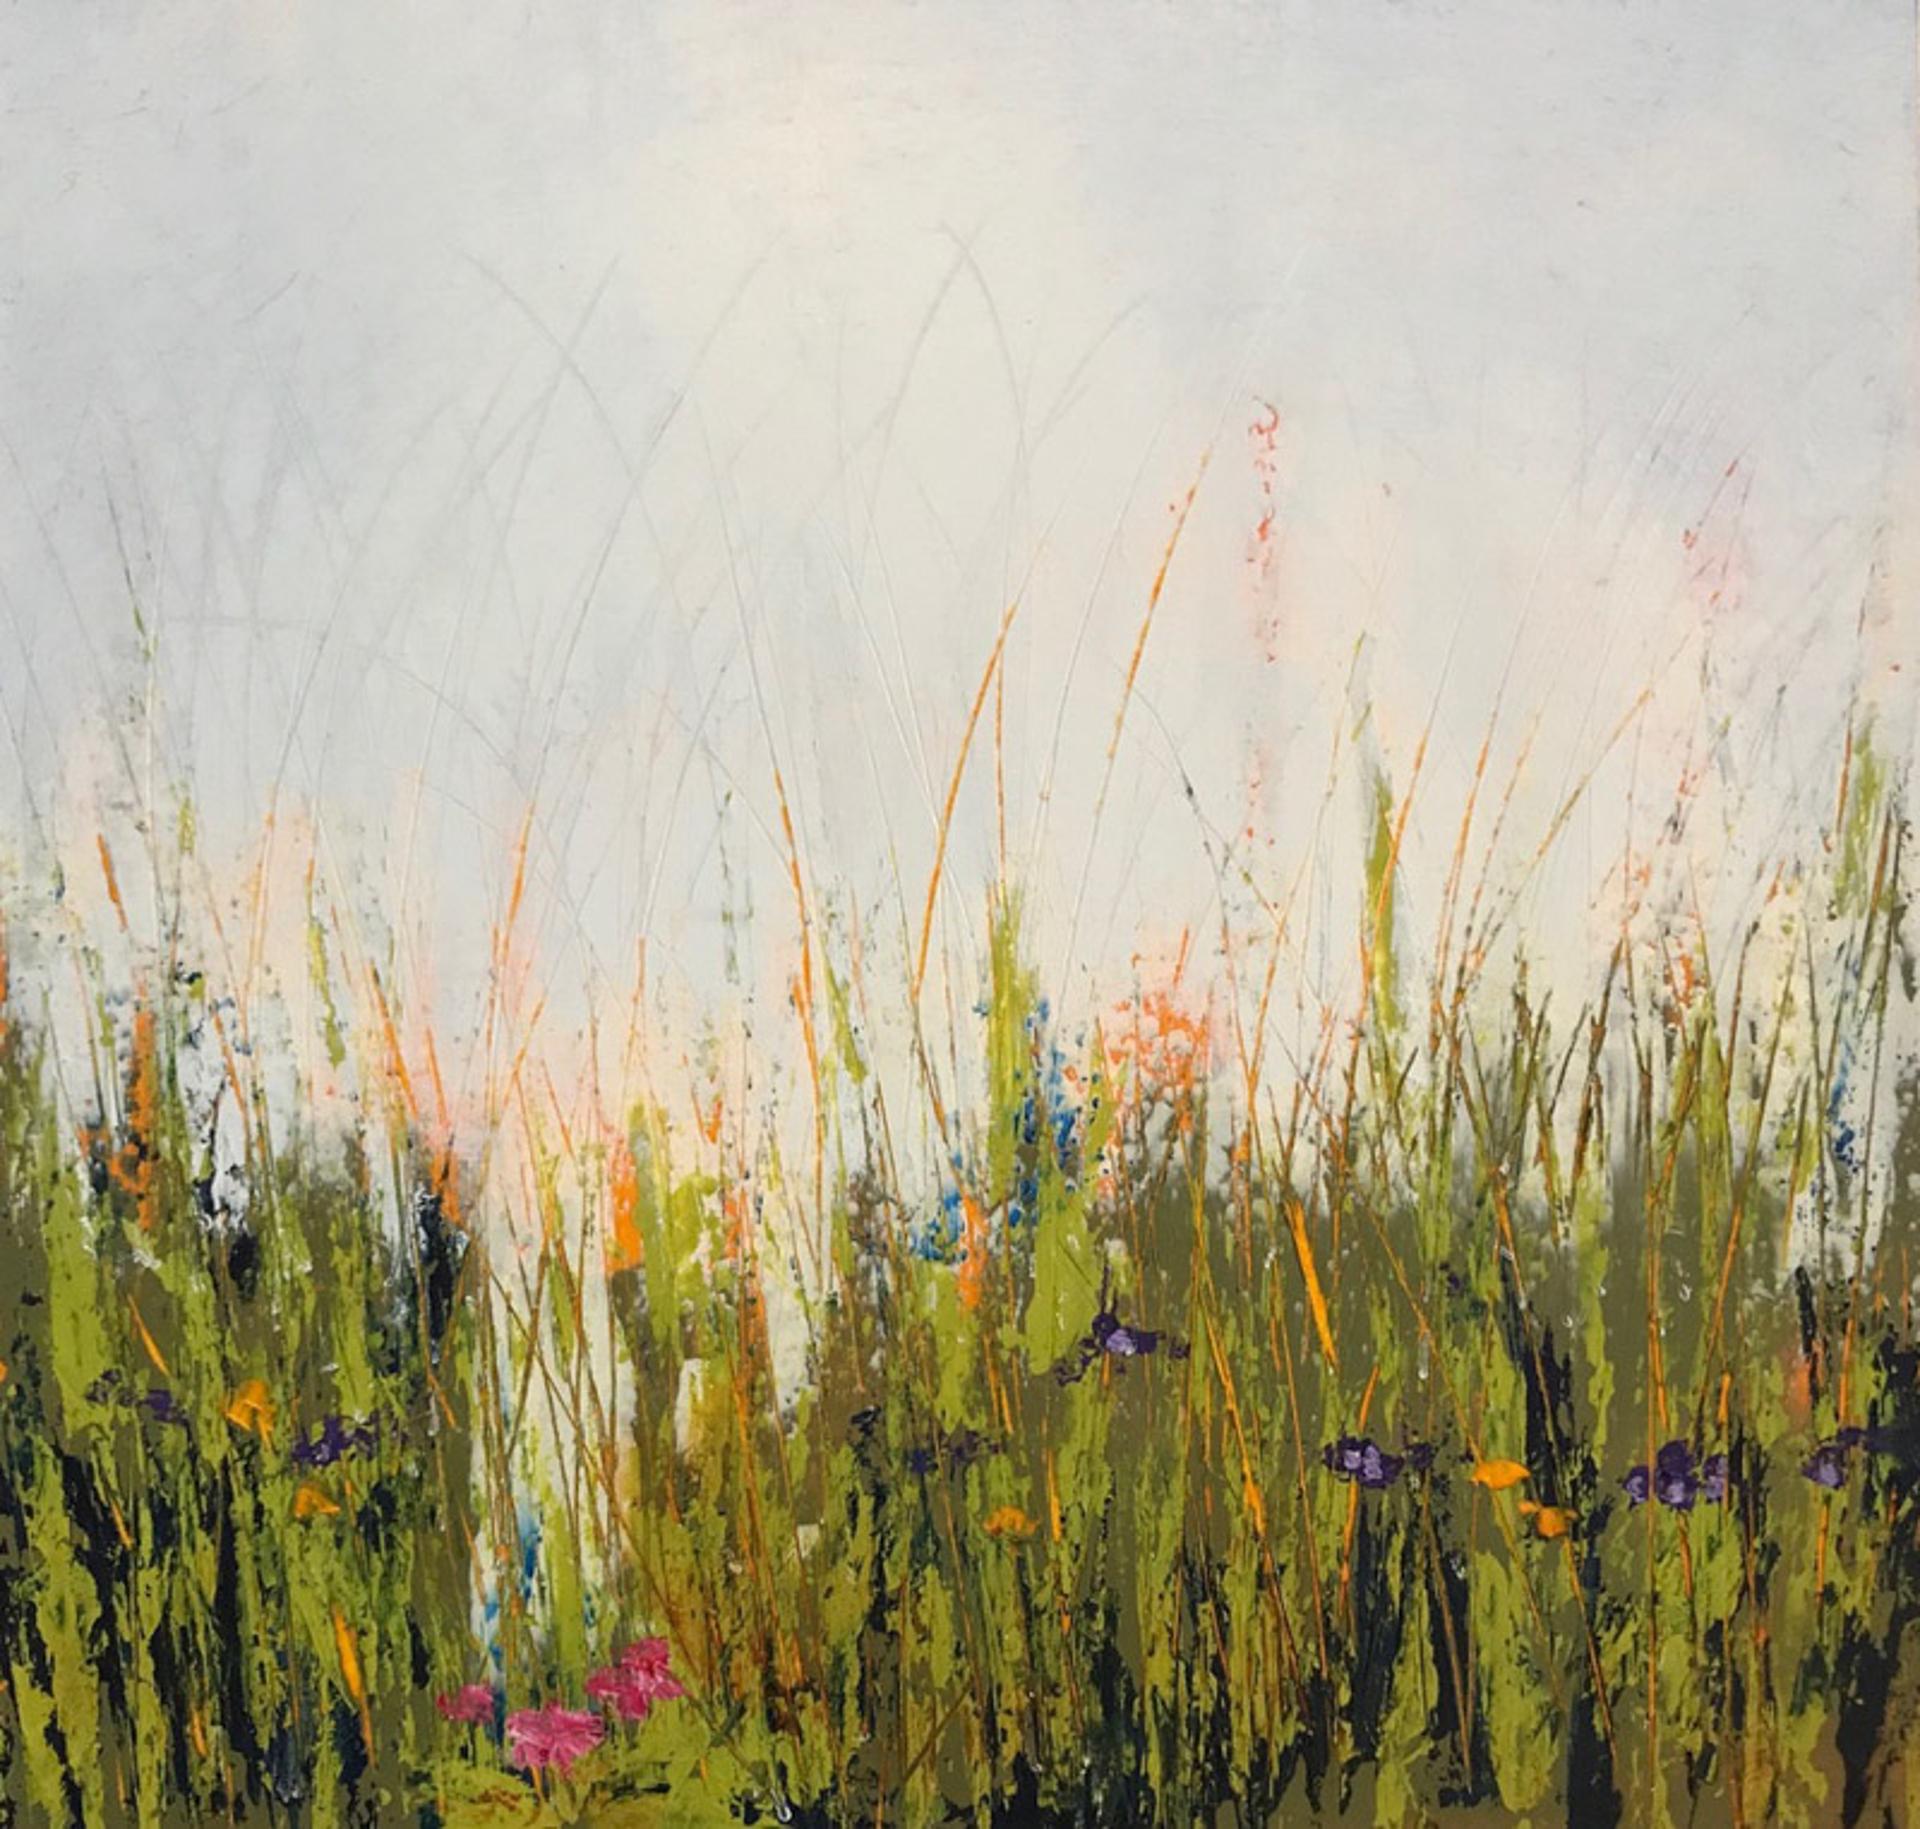 Sandhills Blooms #1 by Lori Elliott-Bartle